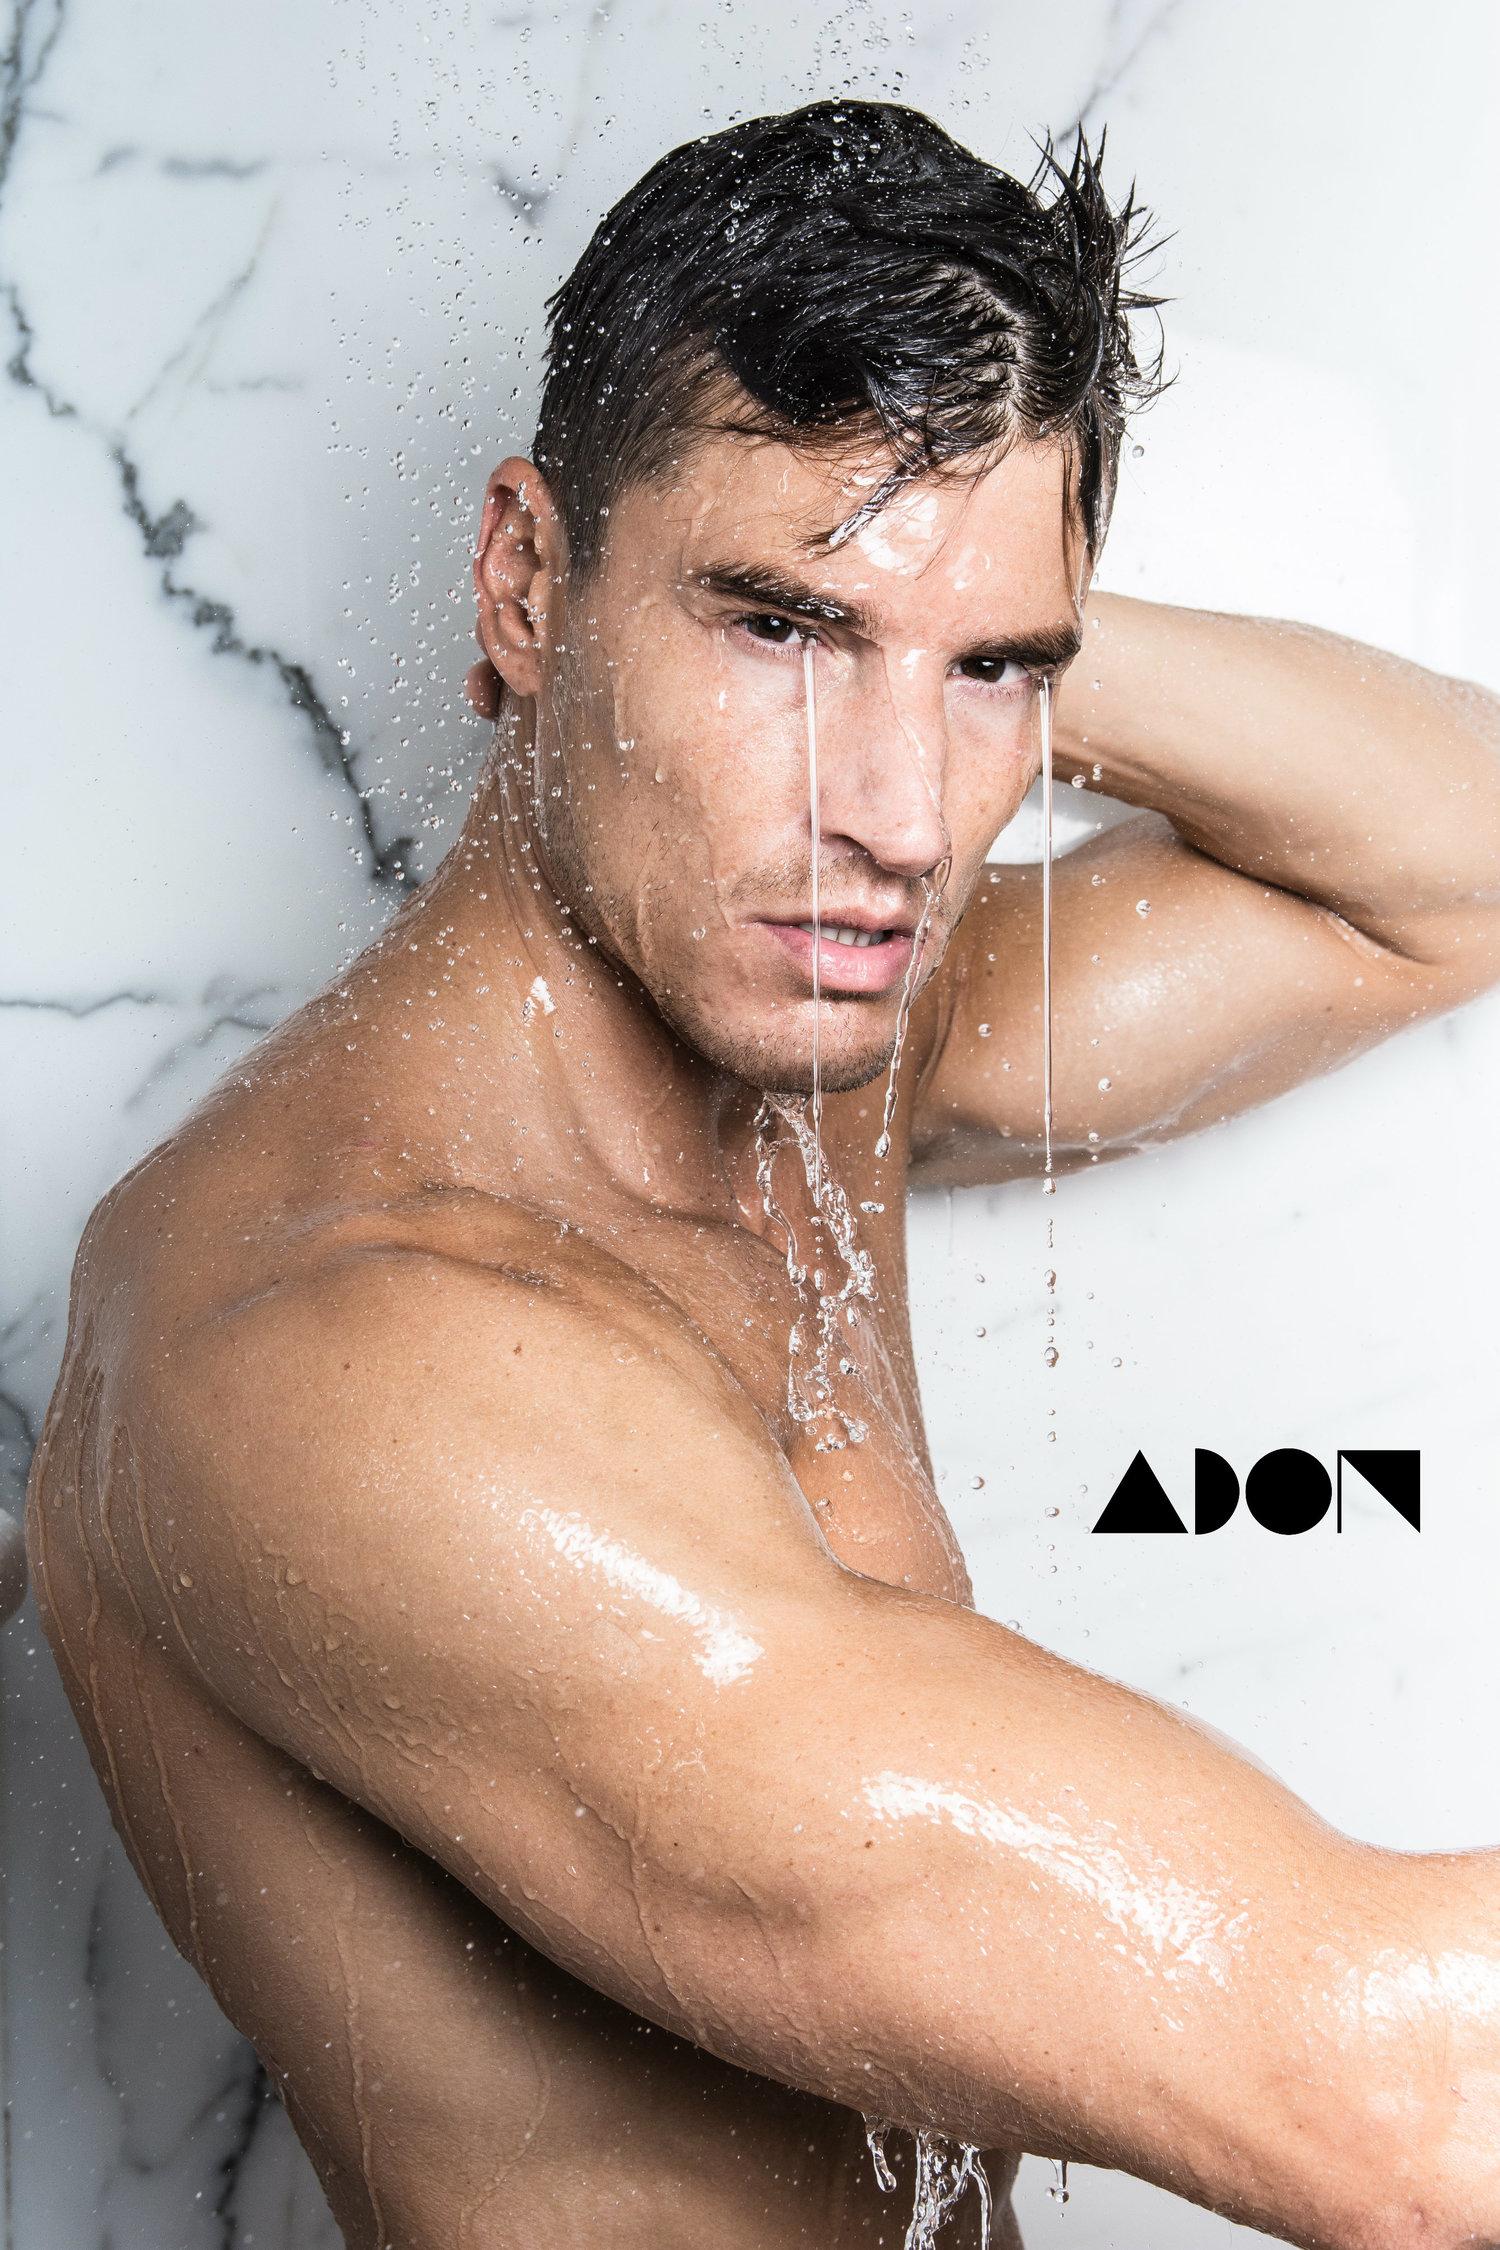 Adon Exclusive: Model Ramon By Gustav Lagos